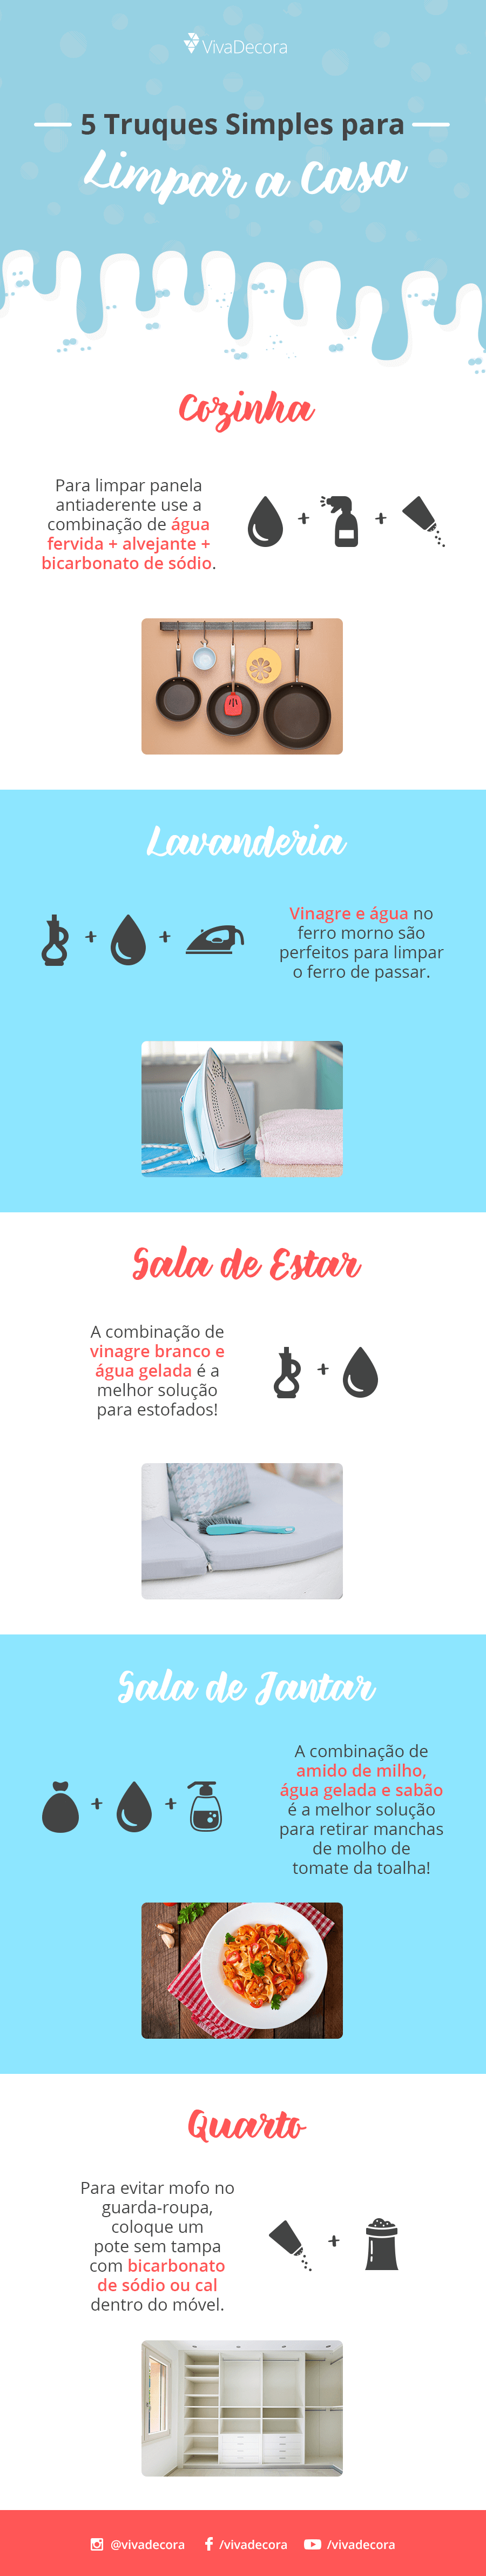 Infográfico - 5 truques simples para limpar a casa